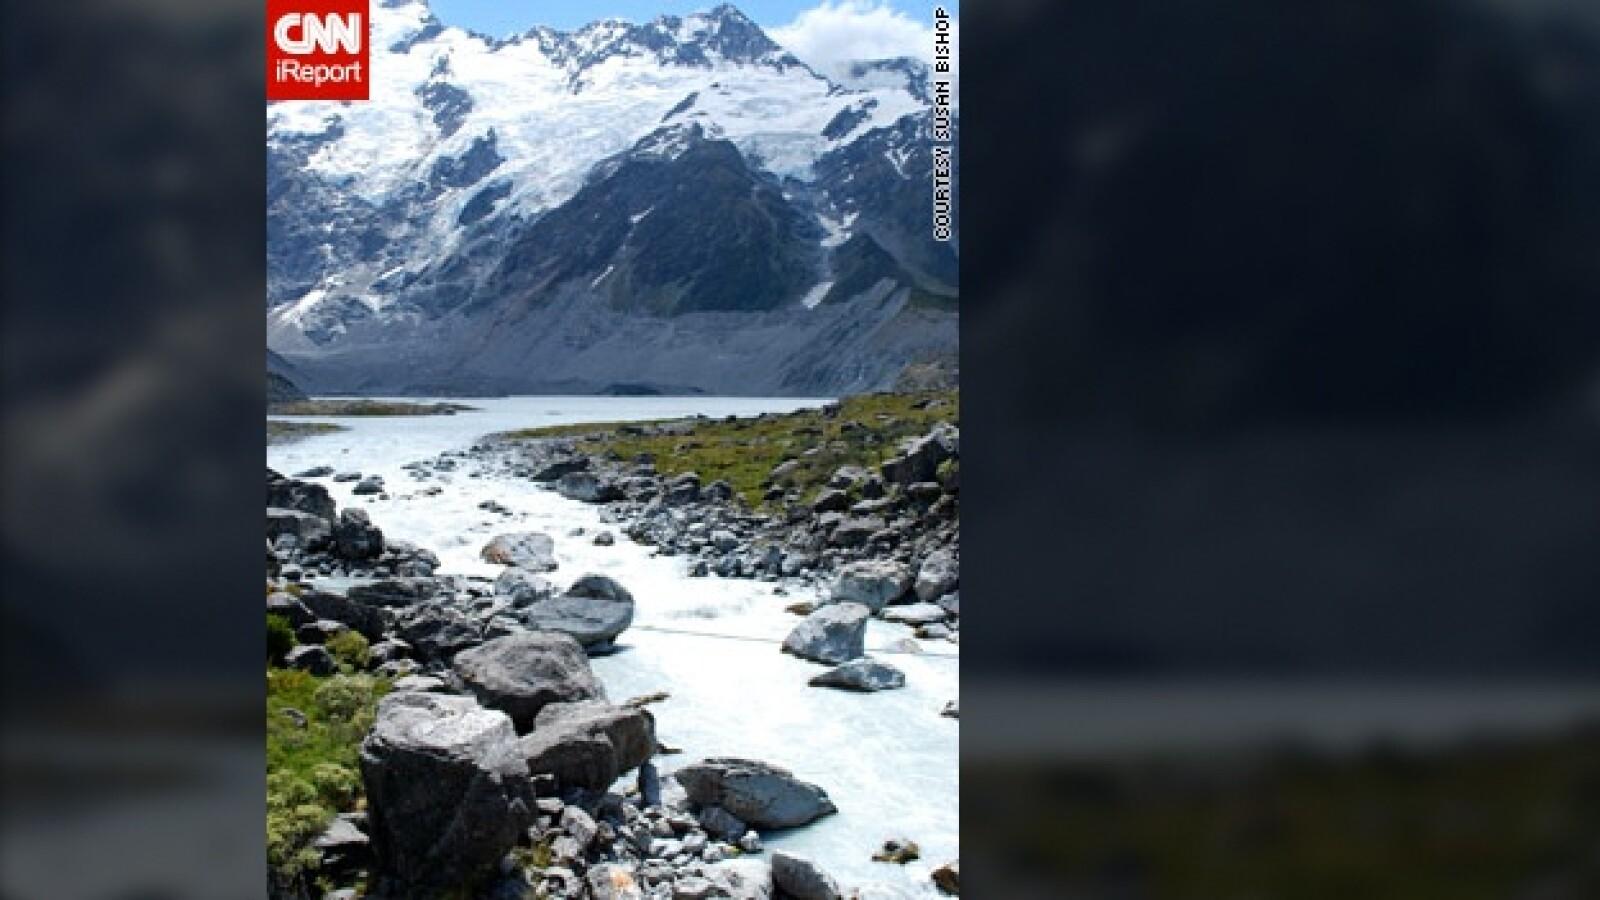 nueva zelandia ireport viajes destinos europa 10